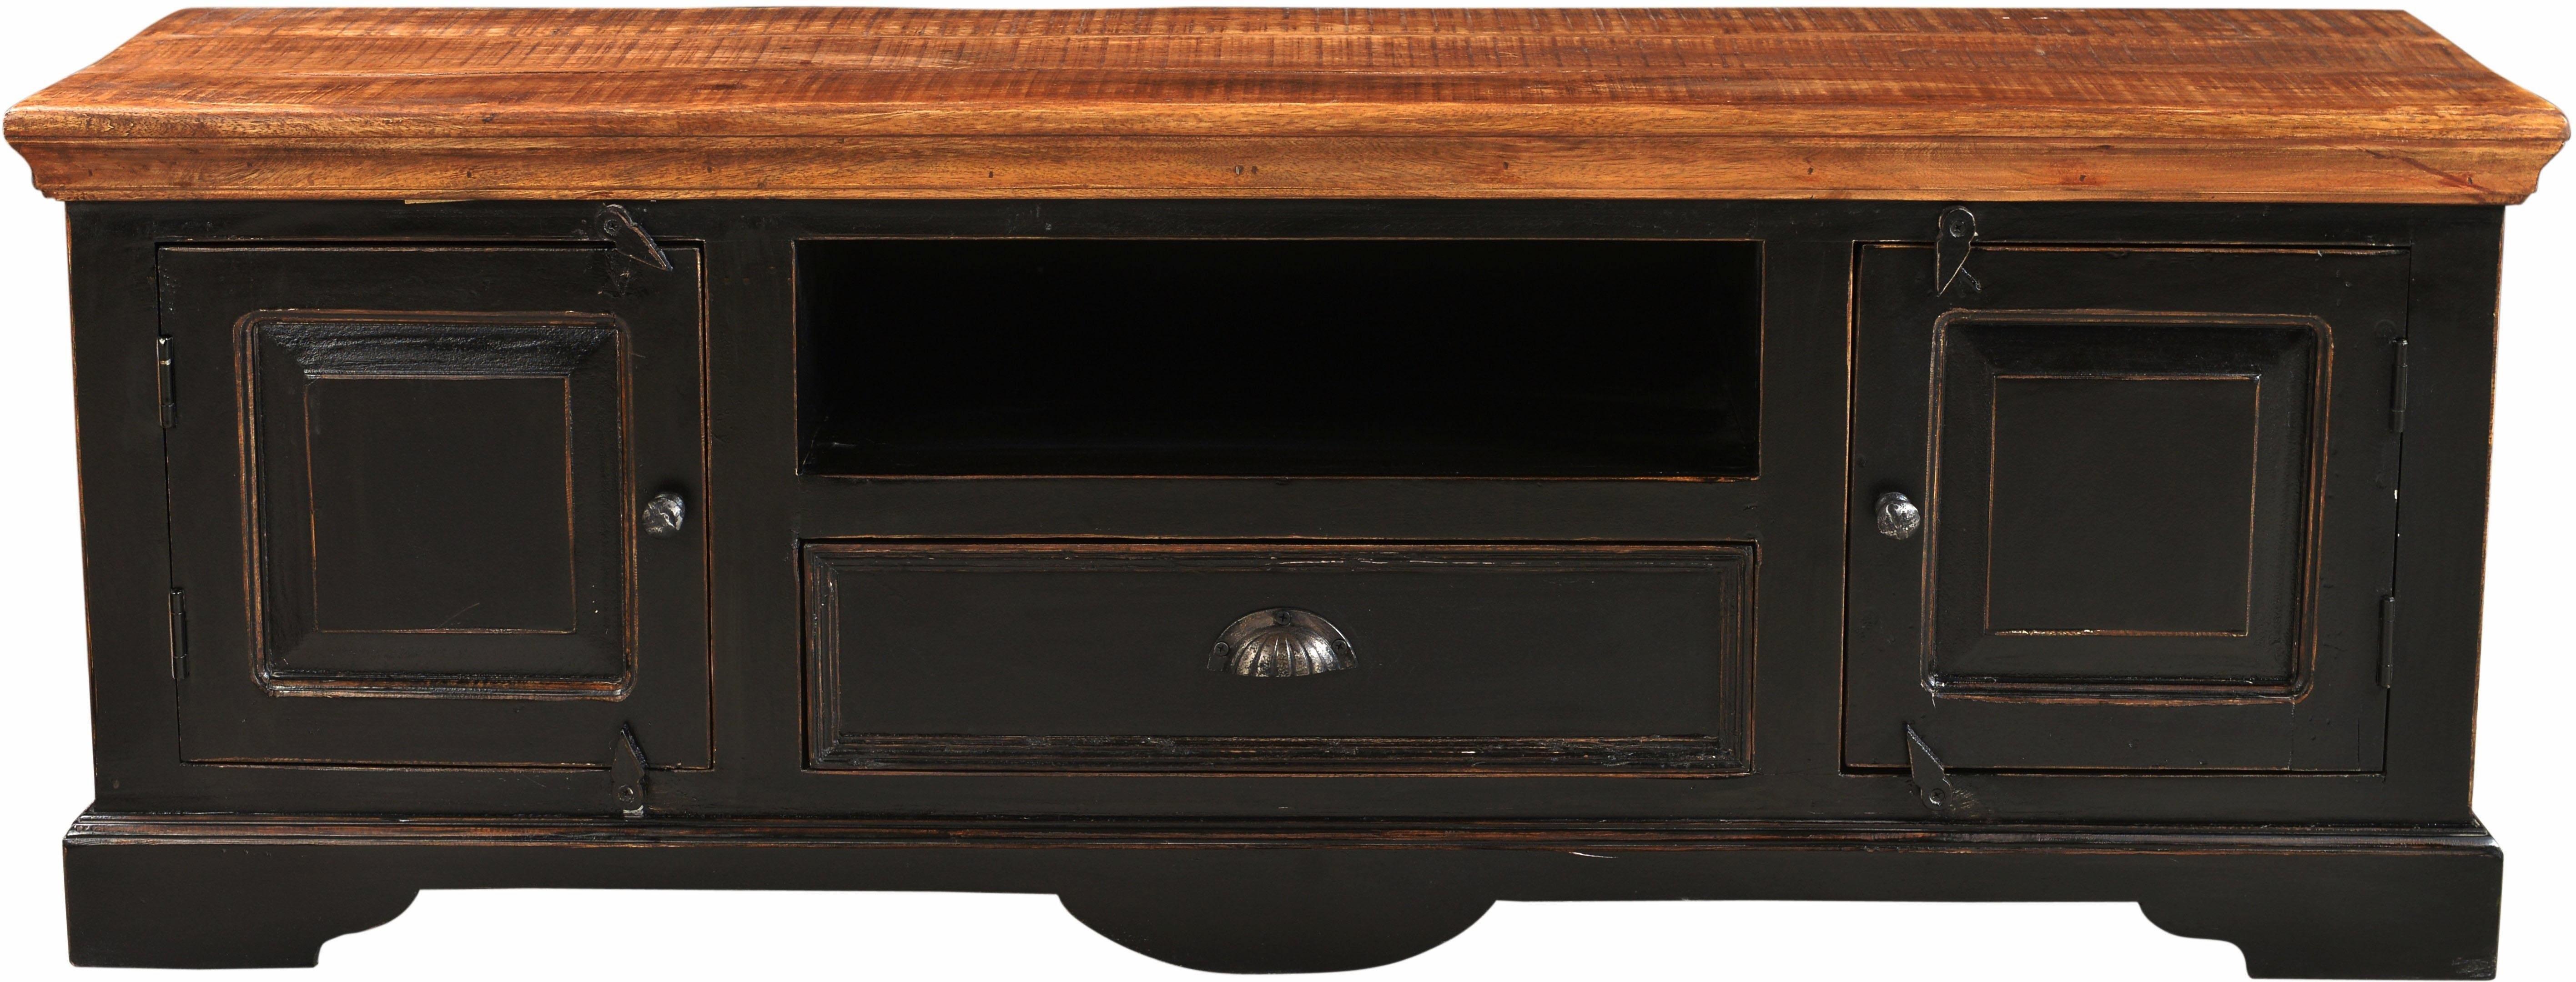 Sit tv meubel corsica breedte 140 cm in de online shop for Meubel sale